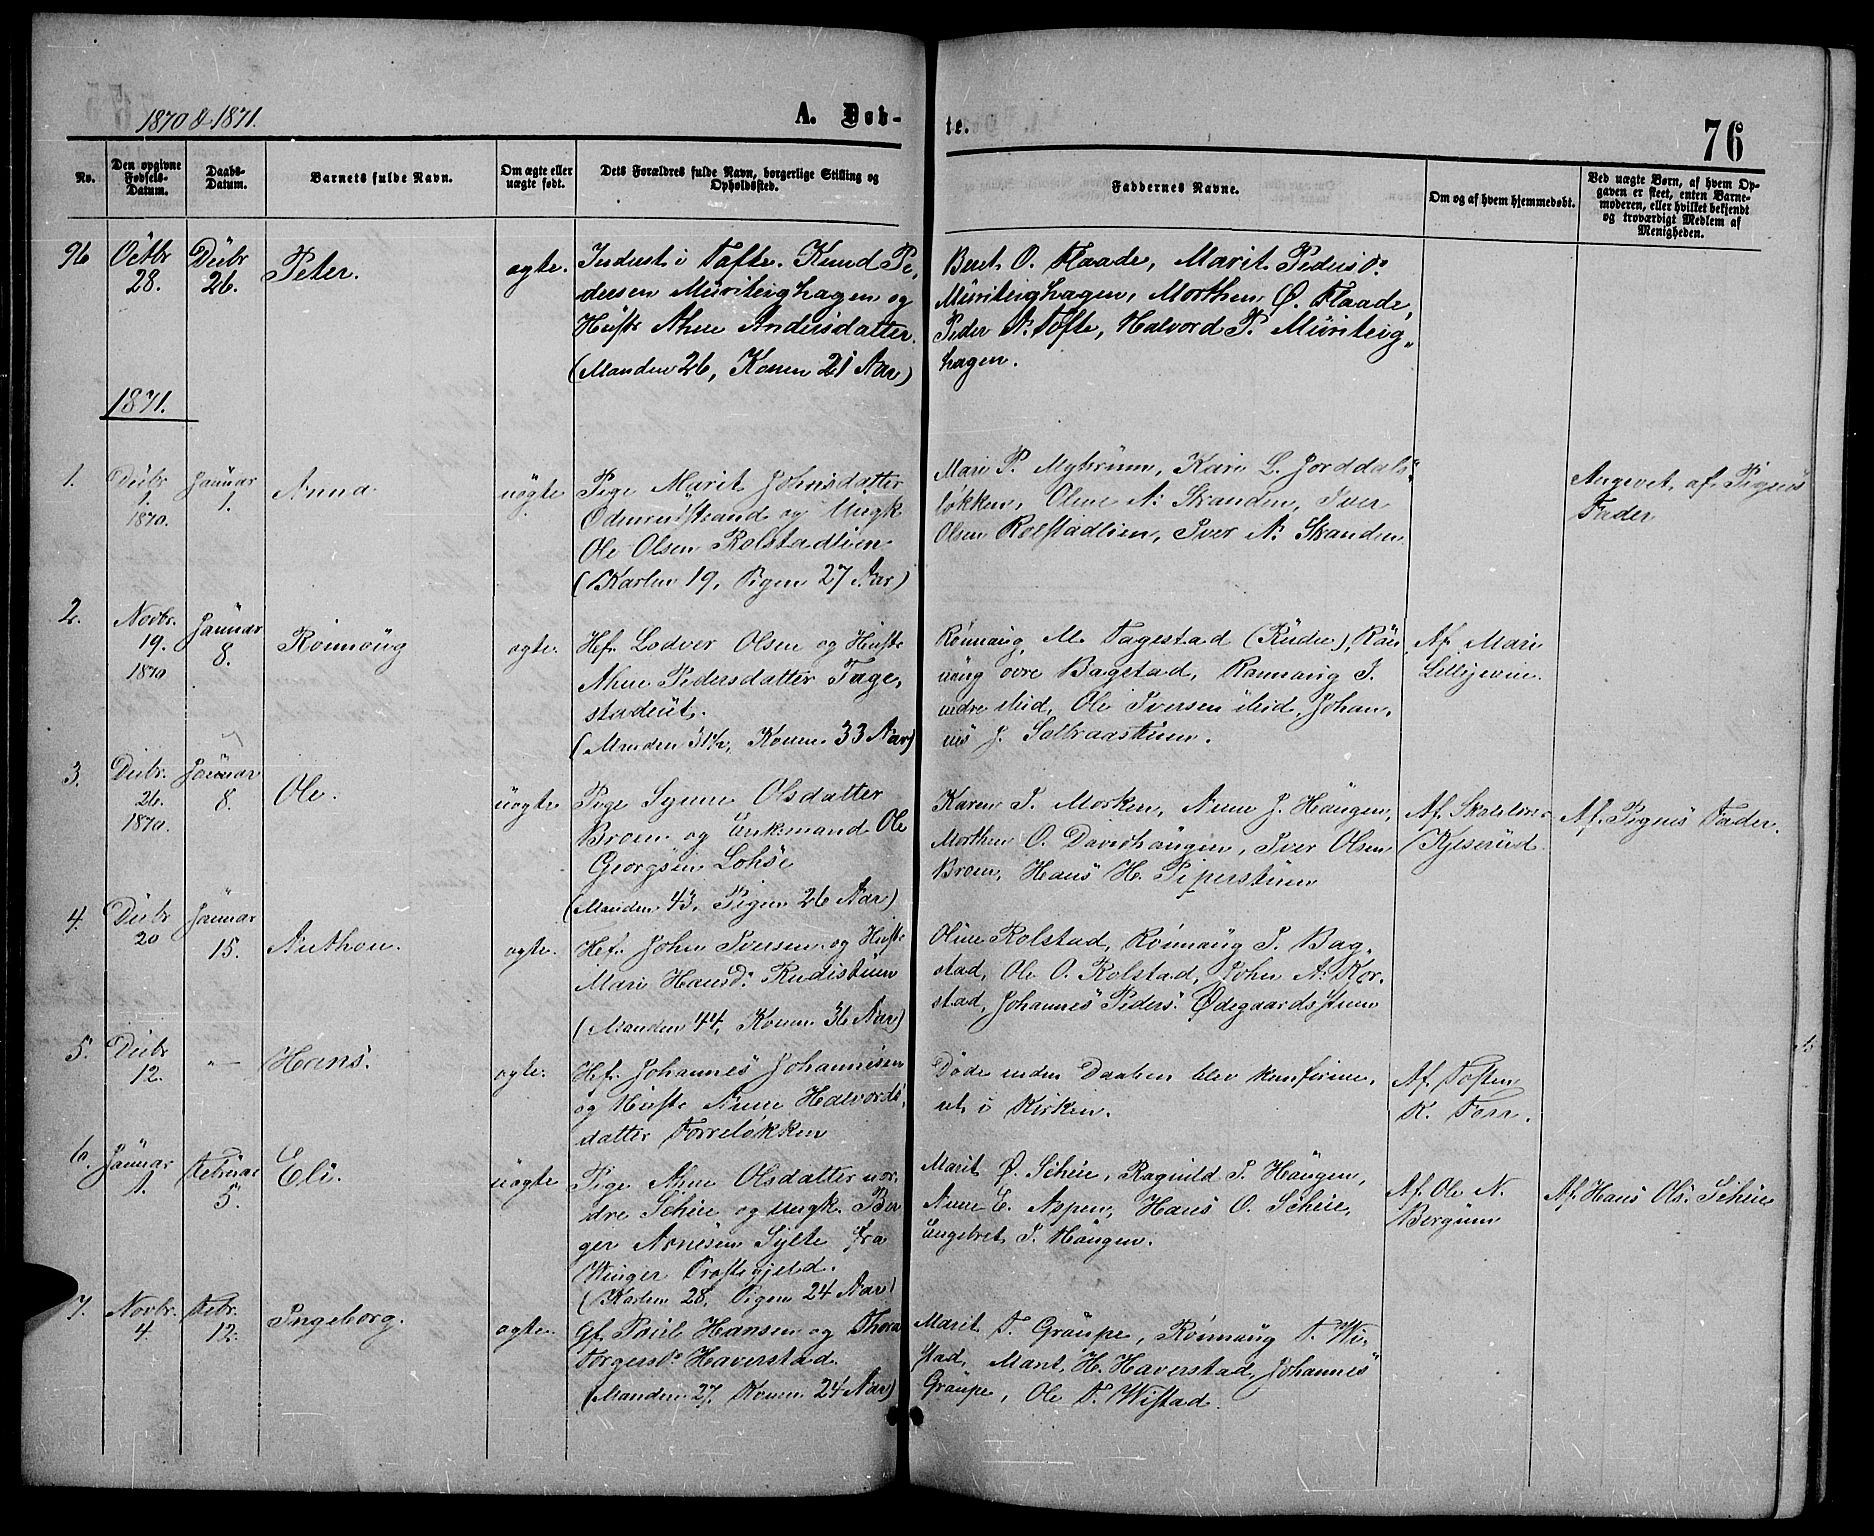 SAH, Sør-Fron prestekontor, H/Ha/Hab/L0002: Klokkerbok nr. 2, 1864-1883, s. 76